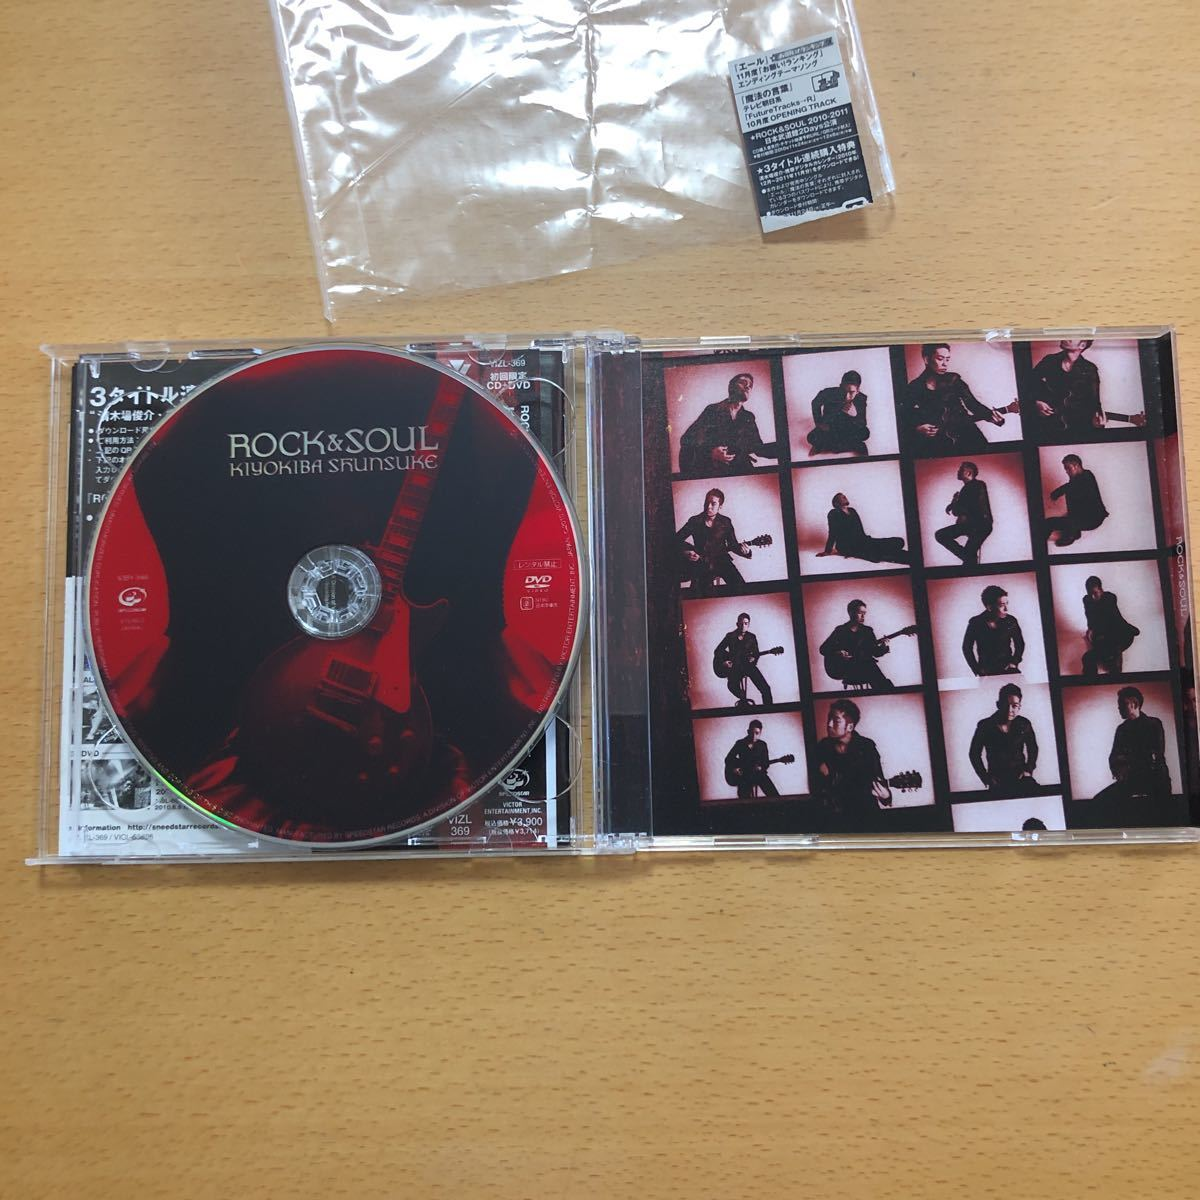 清木場俊介『ROCK&SOUL』初回限定盤CD+DVD☆帯付☆美品☆アルバム☆71_画像3